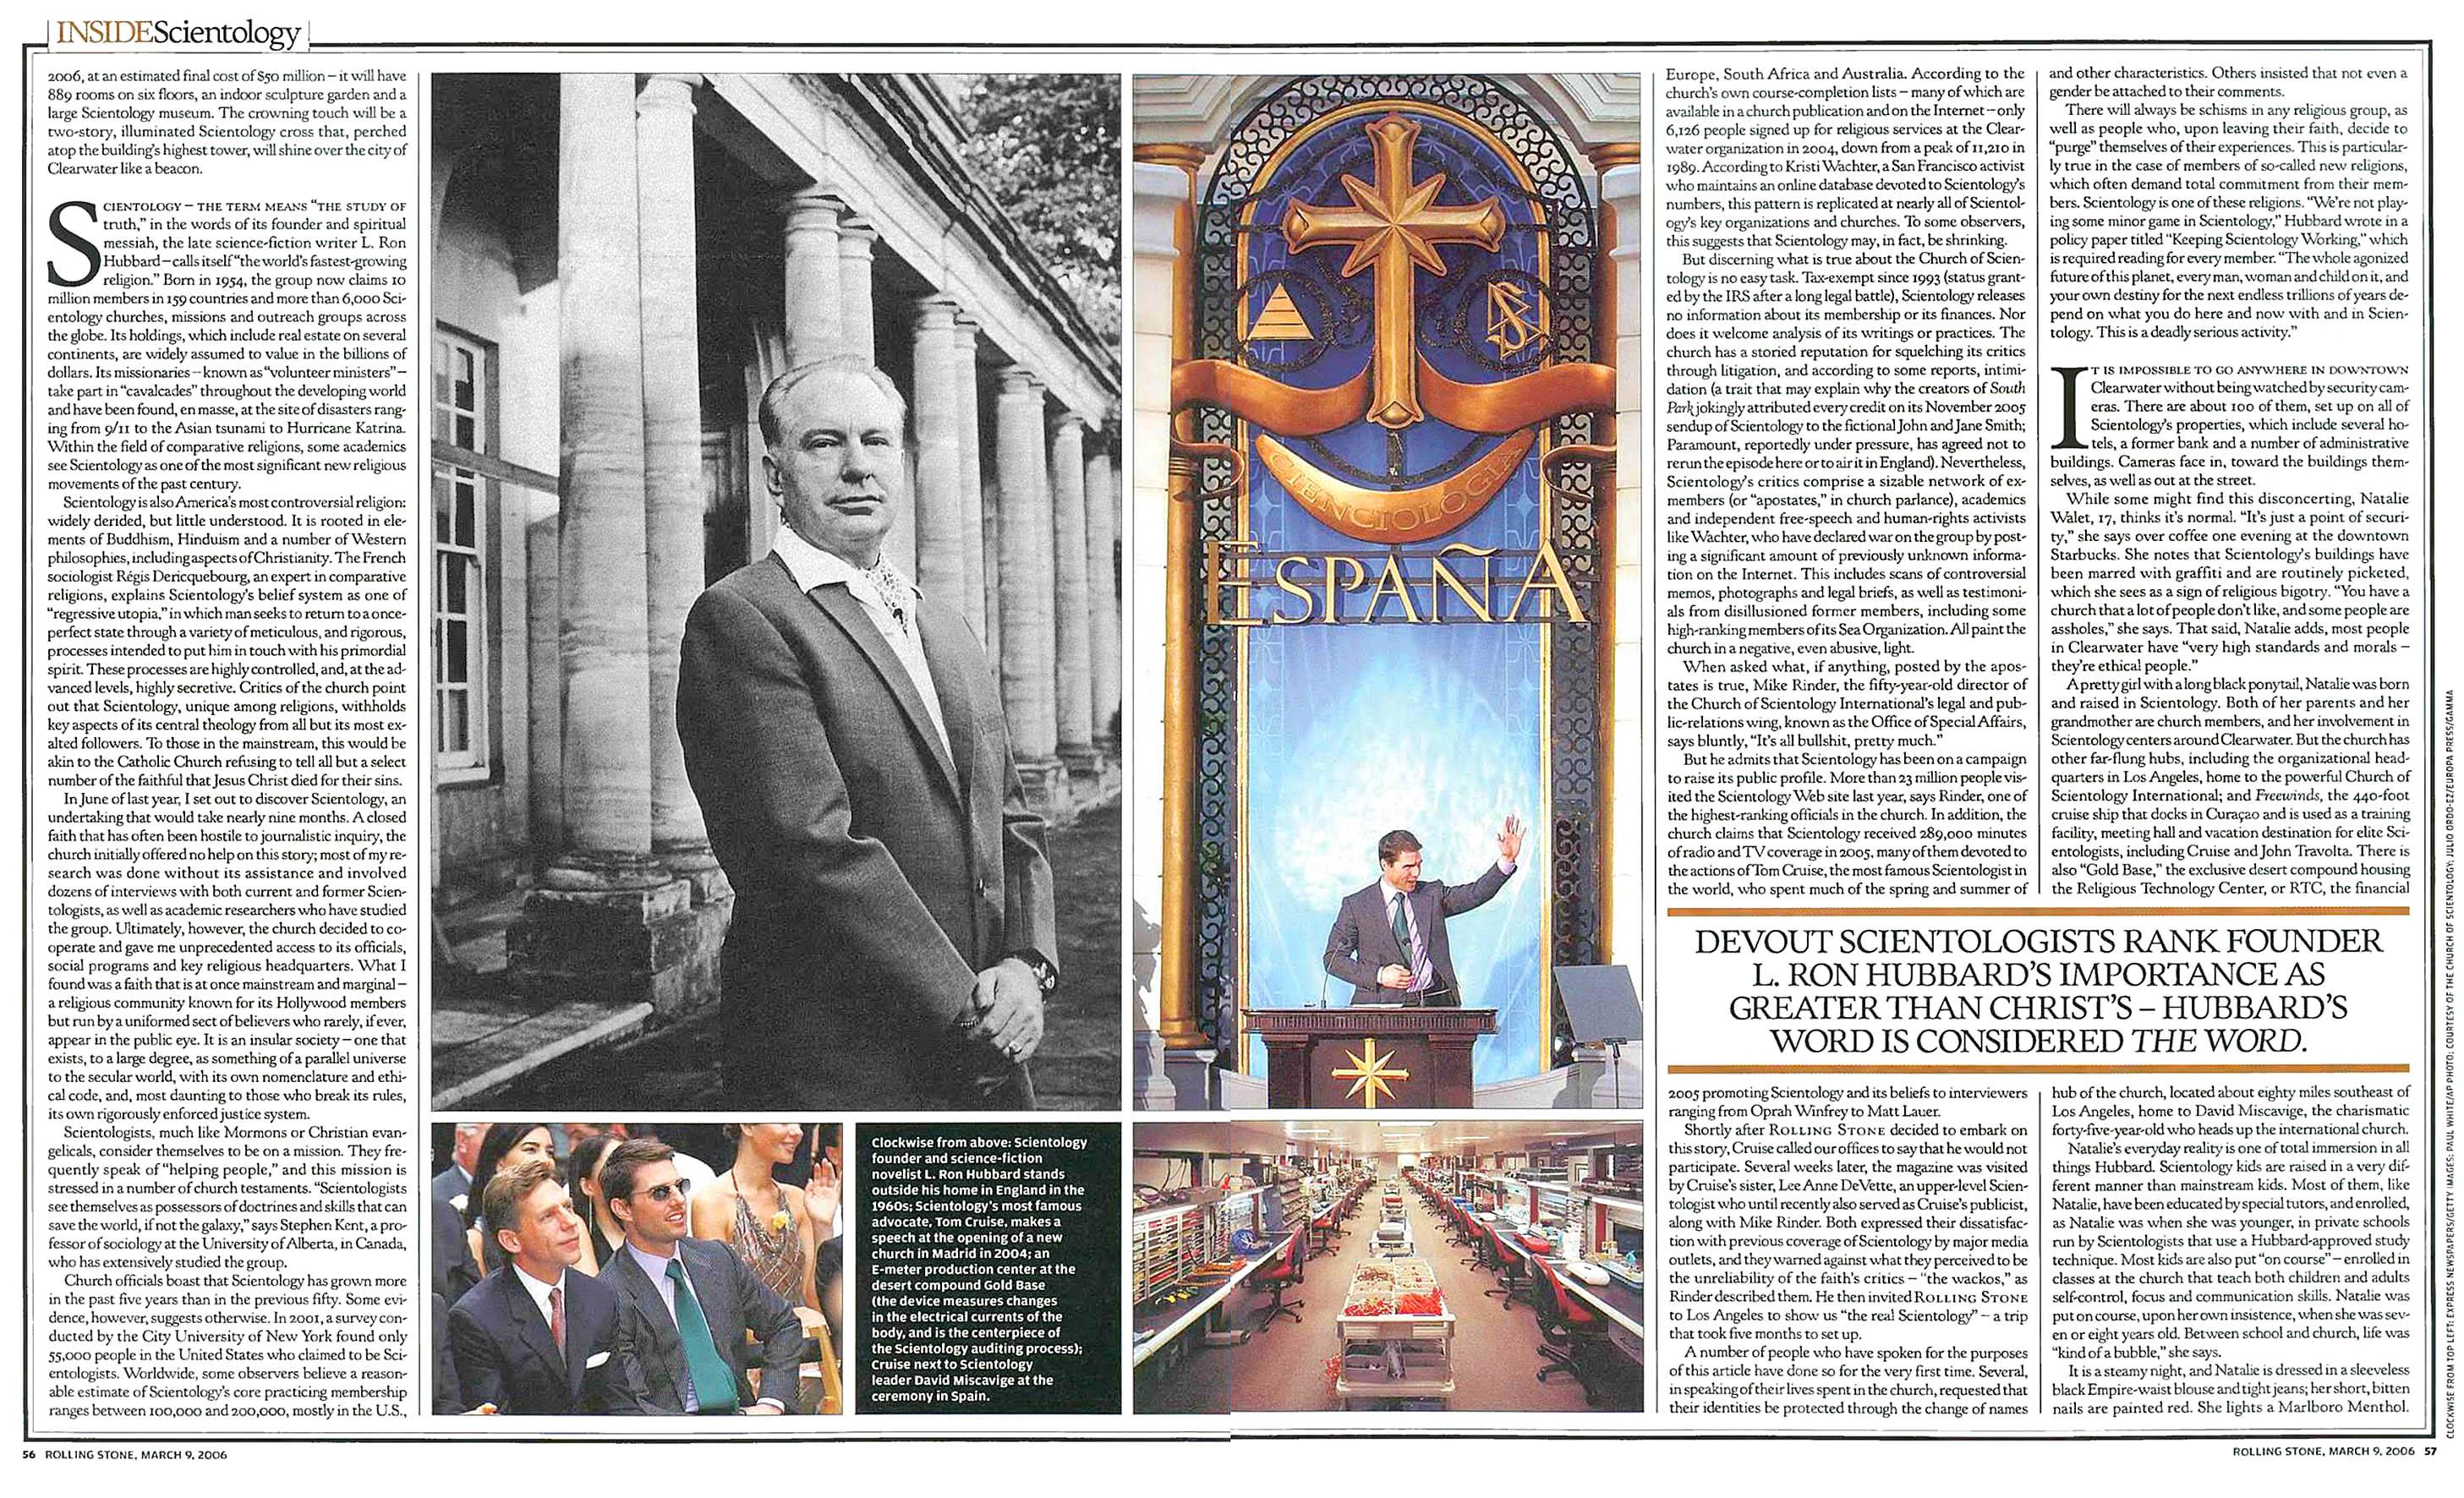 RS 060309 Scientology 02.jpg